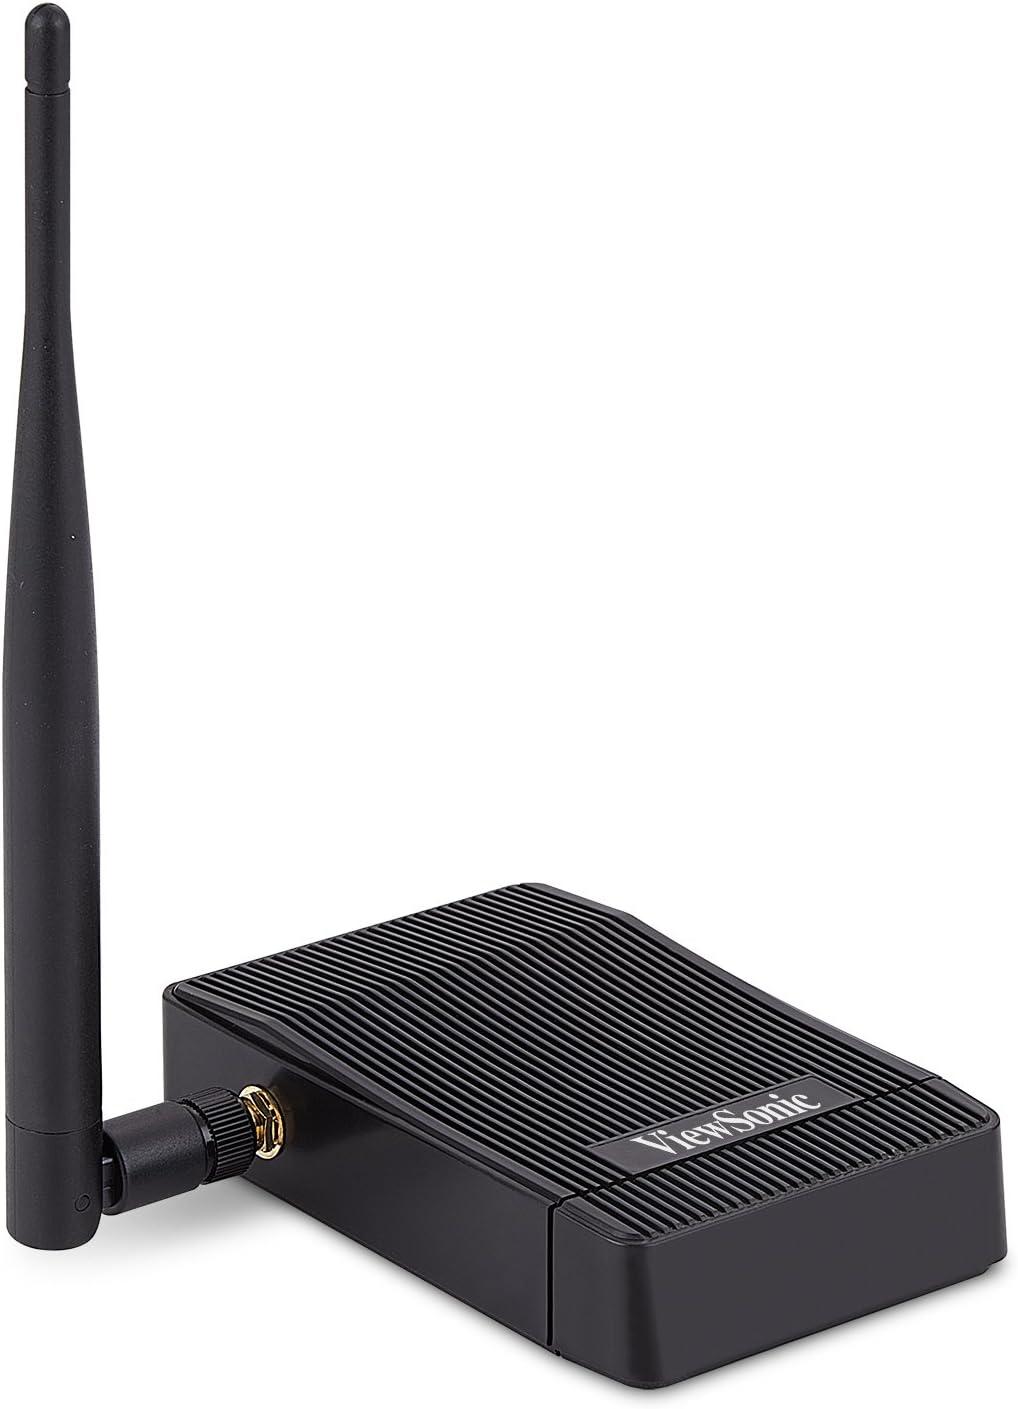 B00SWIYXKA ViewSonic NMP-302W Network Media Player for Digital Signage 71NdVN-km8L.SL1500_